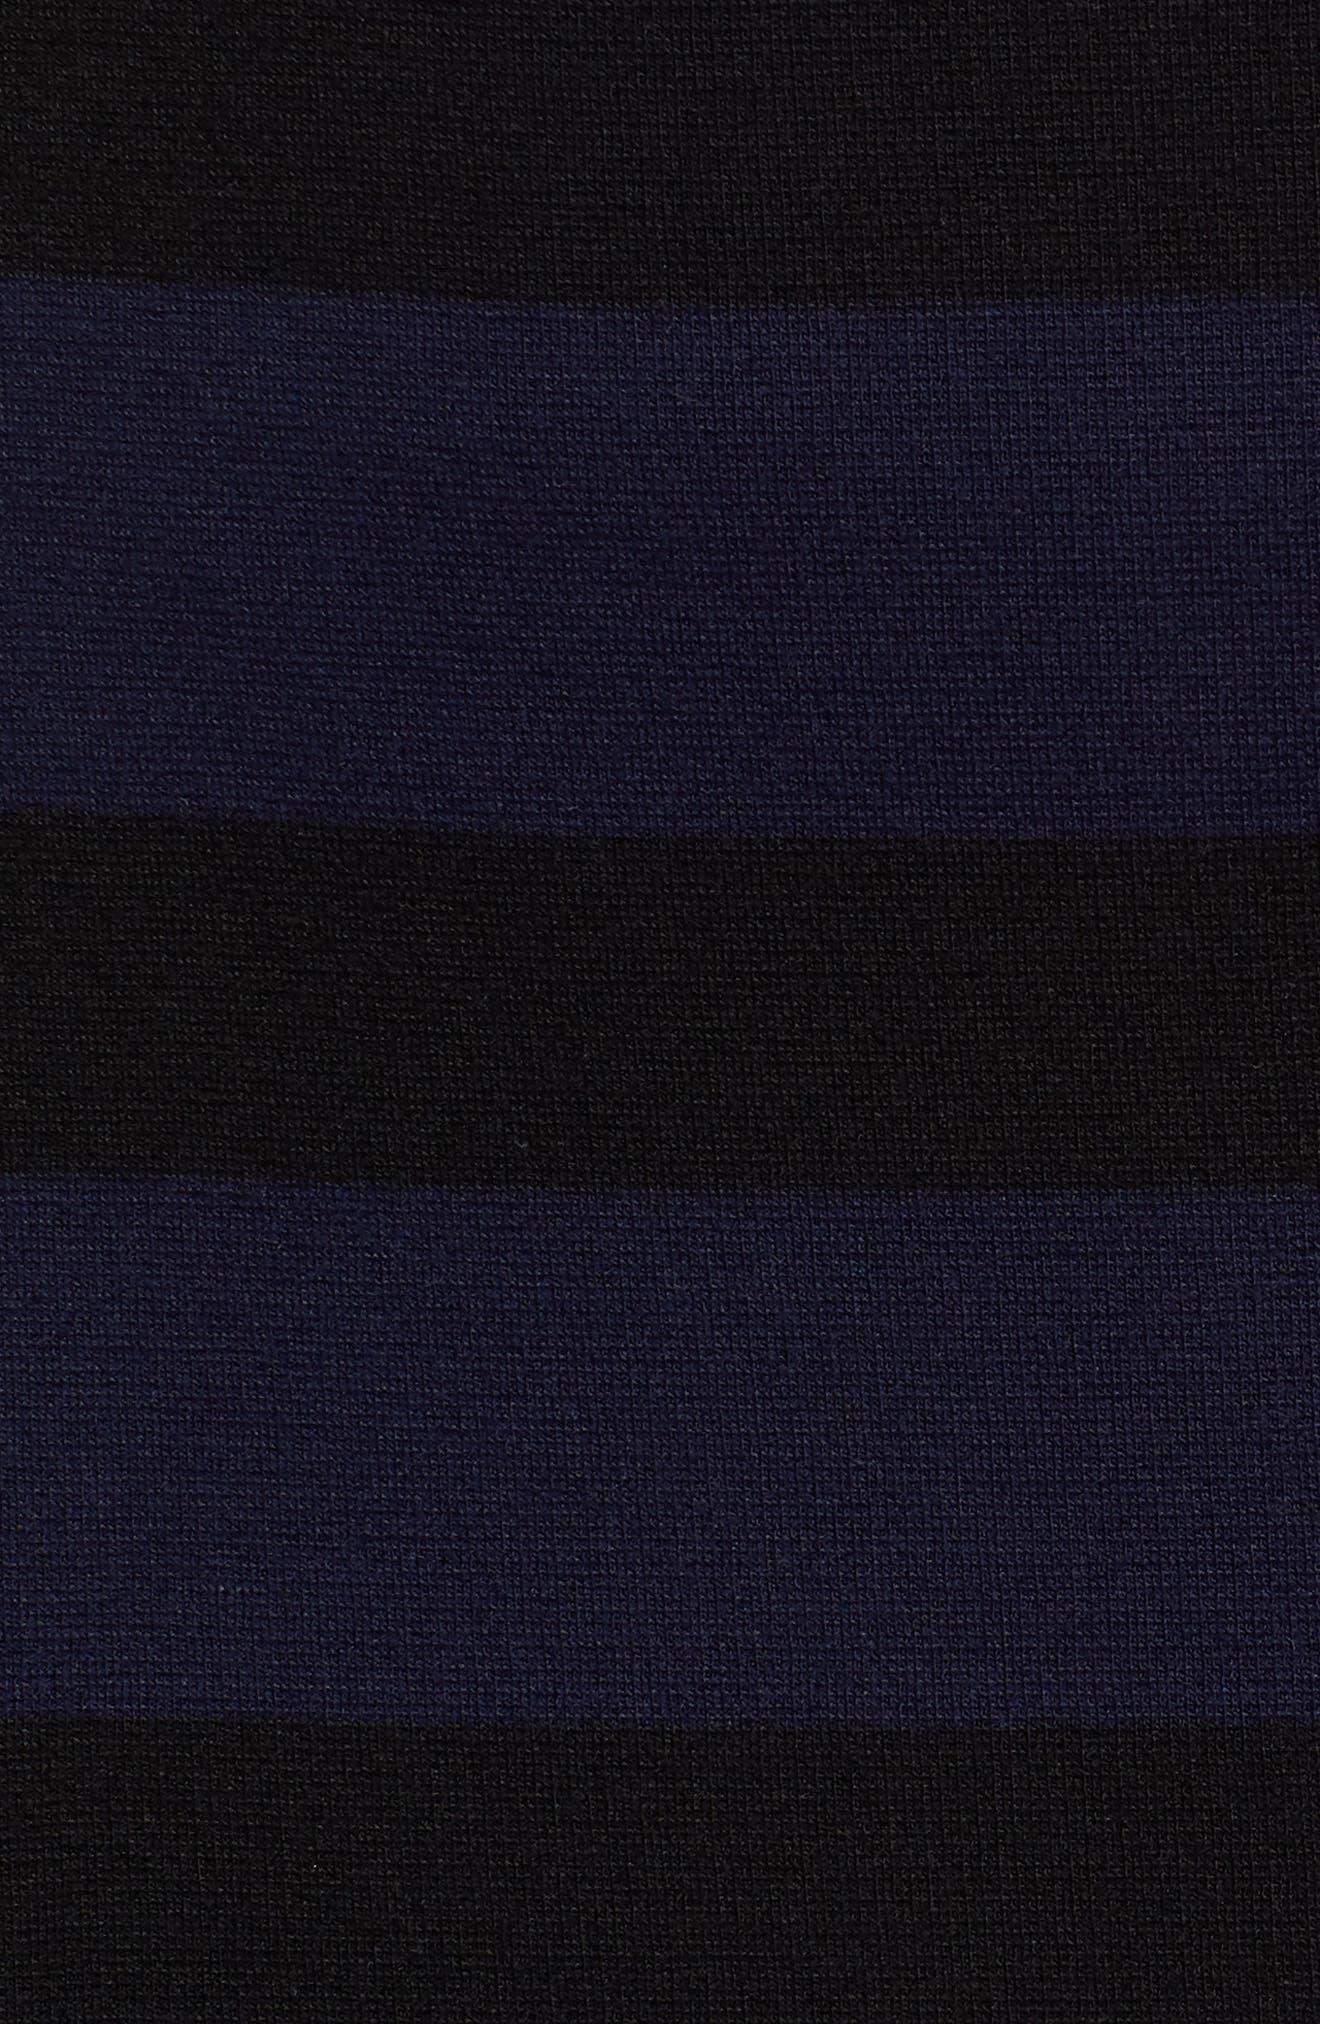 Ebienne Stripe Pencil Skirt,                             Alternate thumbnail 6, color,                             Nautical Blue Fantasy